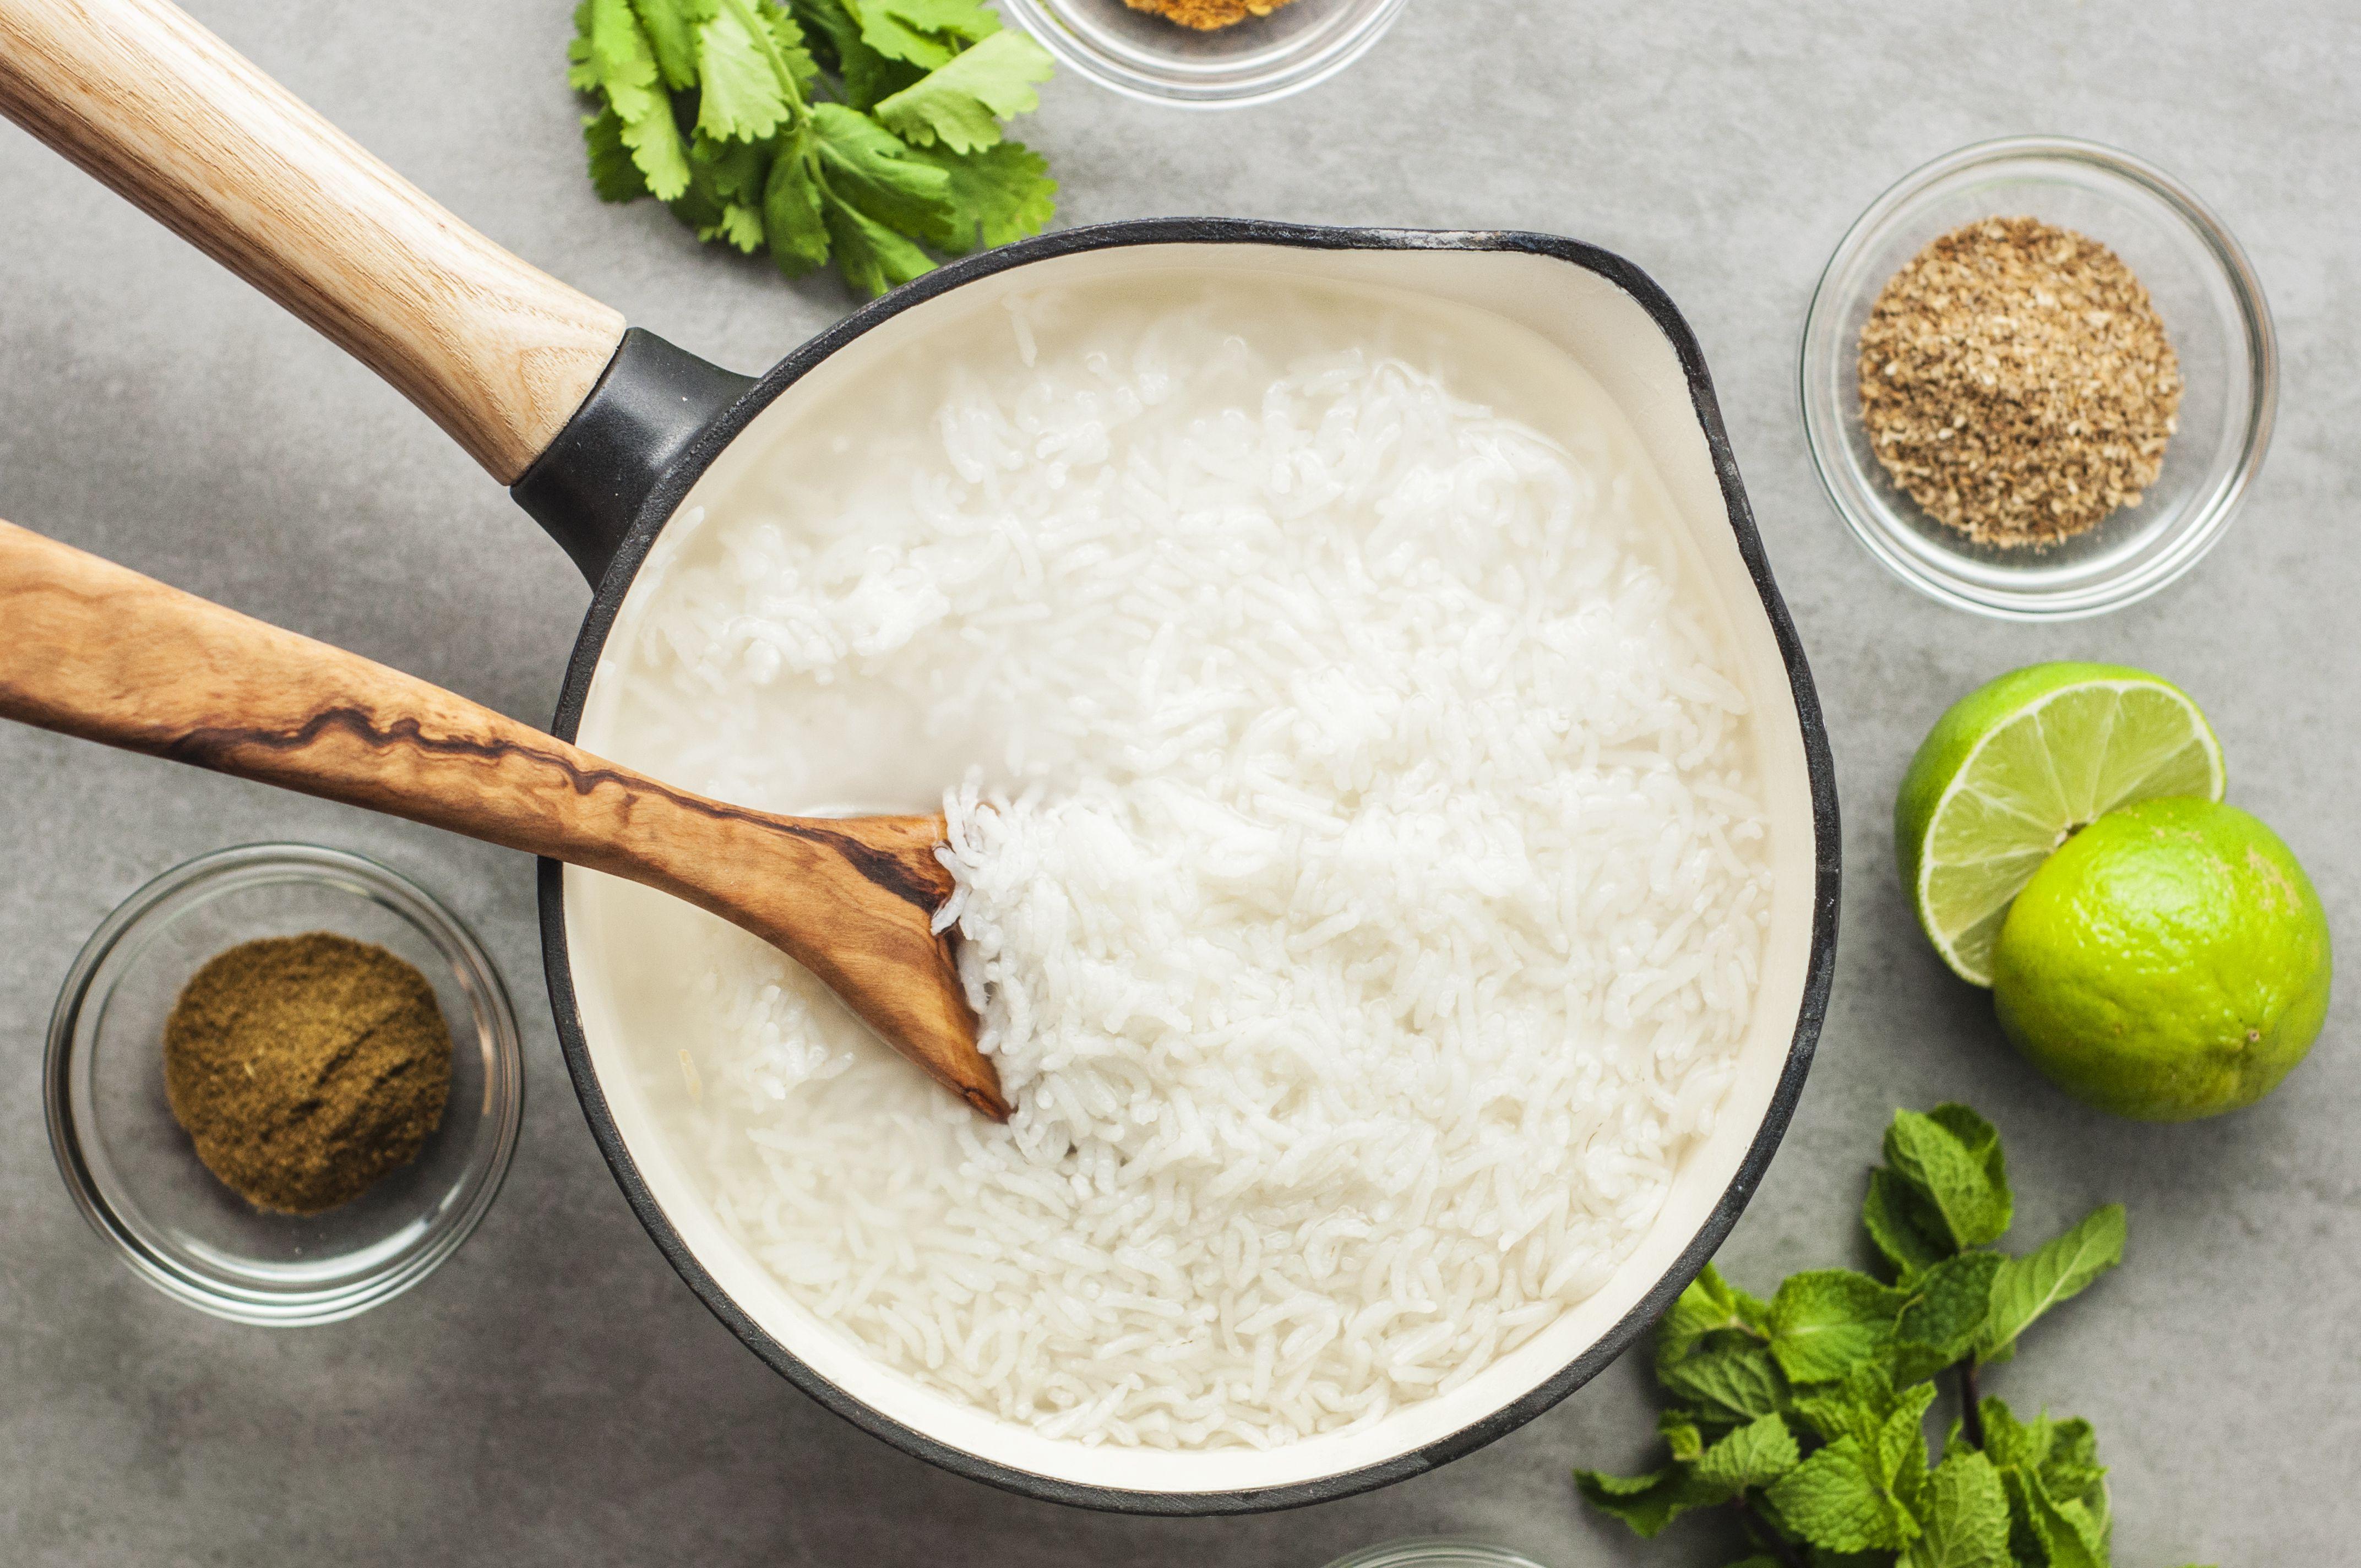 Boil rice until done